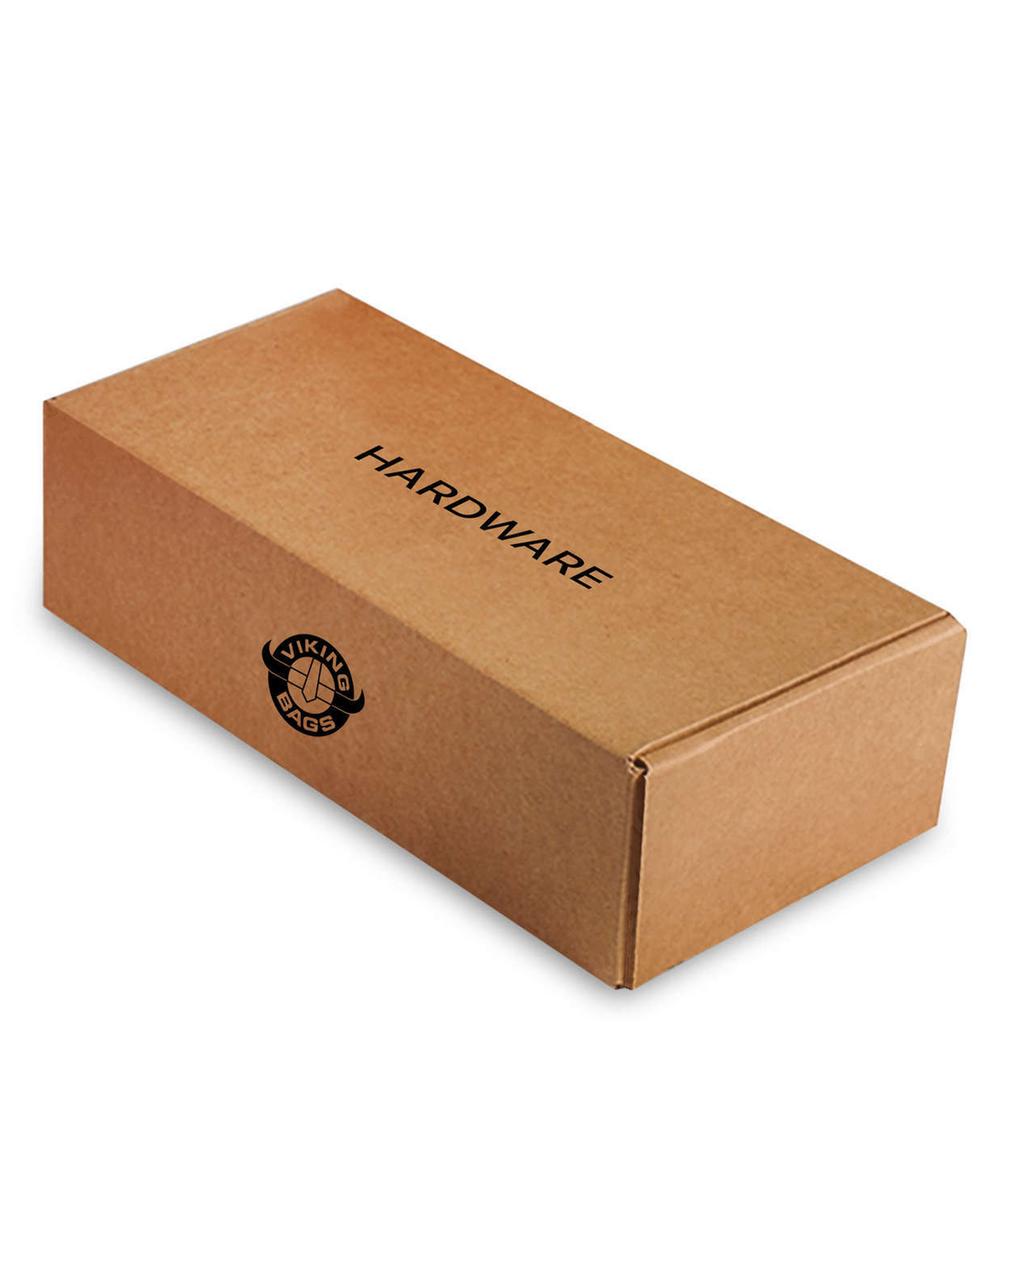 Honda 1100 Shadow Aero Lamellar Extra Large Shock Cutout Saddlebag Box